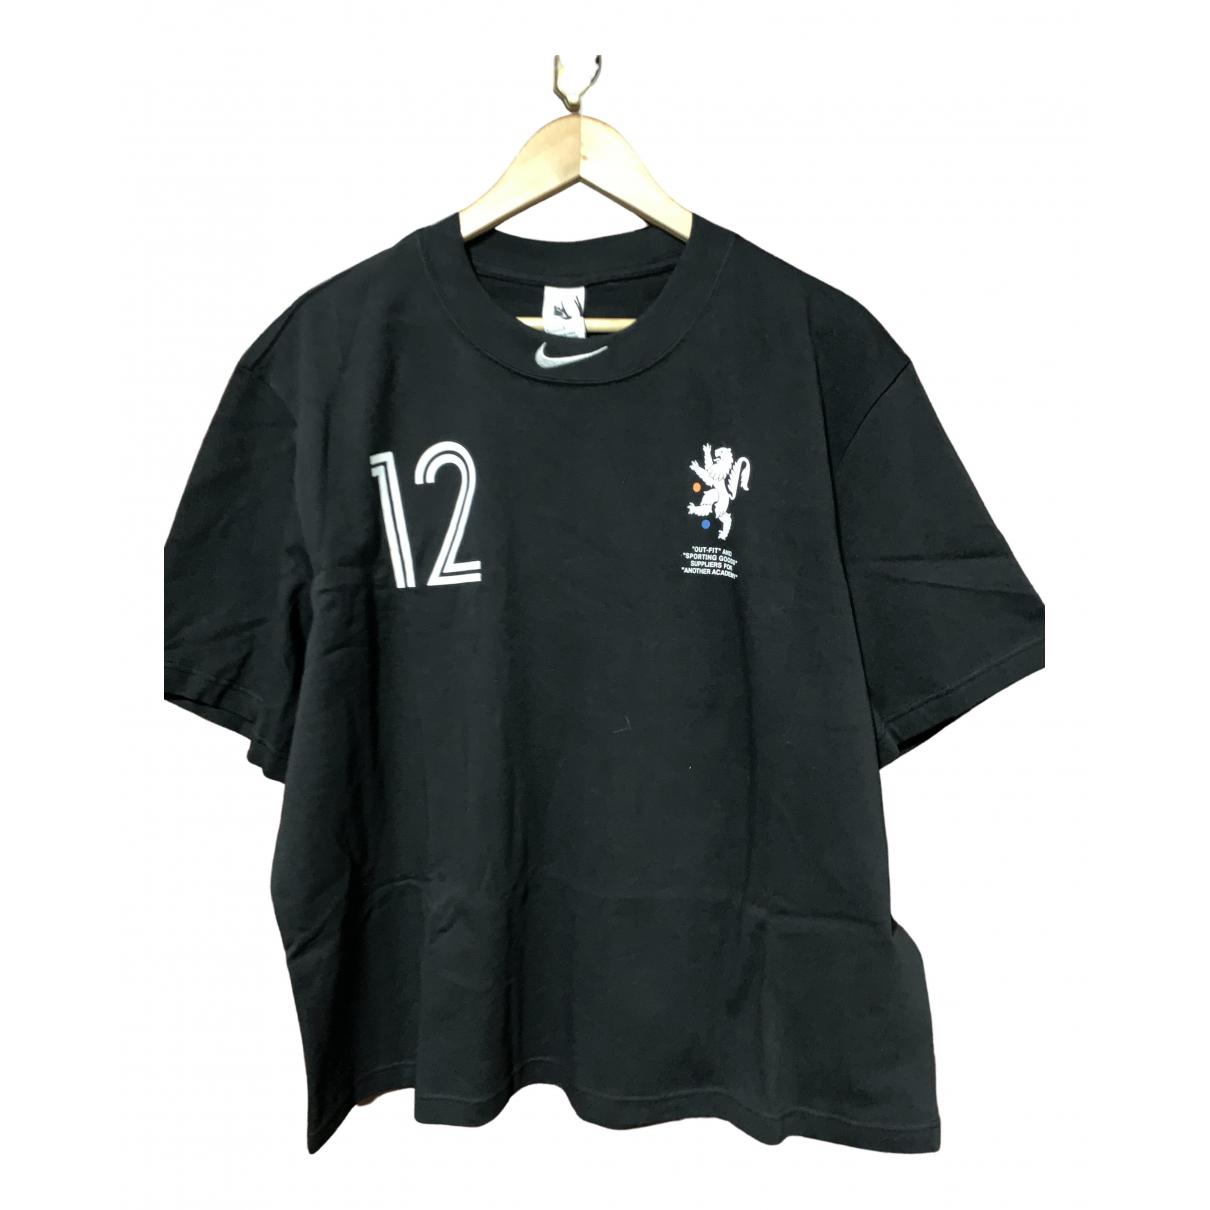 Nike X Off-white - Tee shirts   pour homme en coton - noir